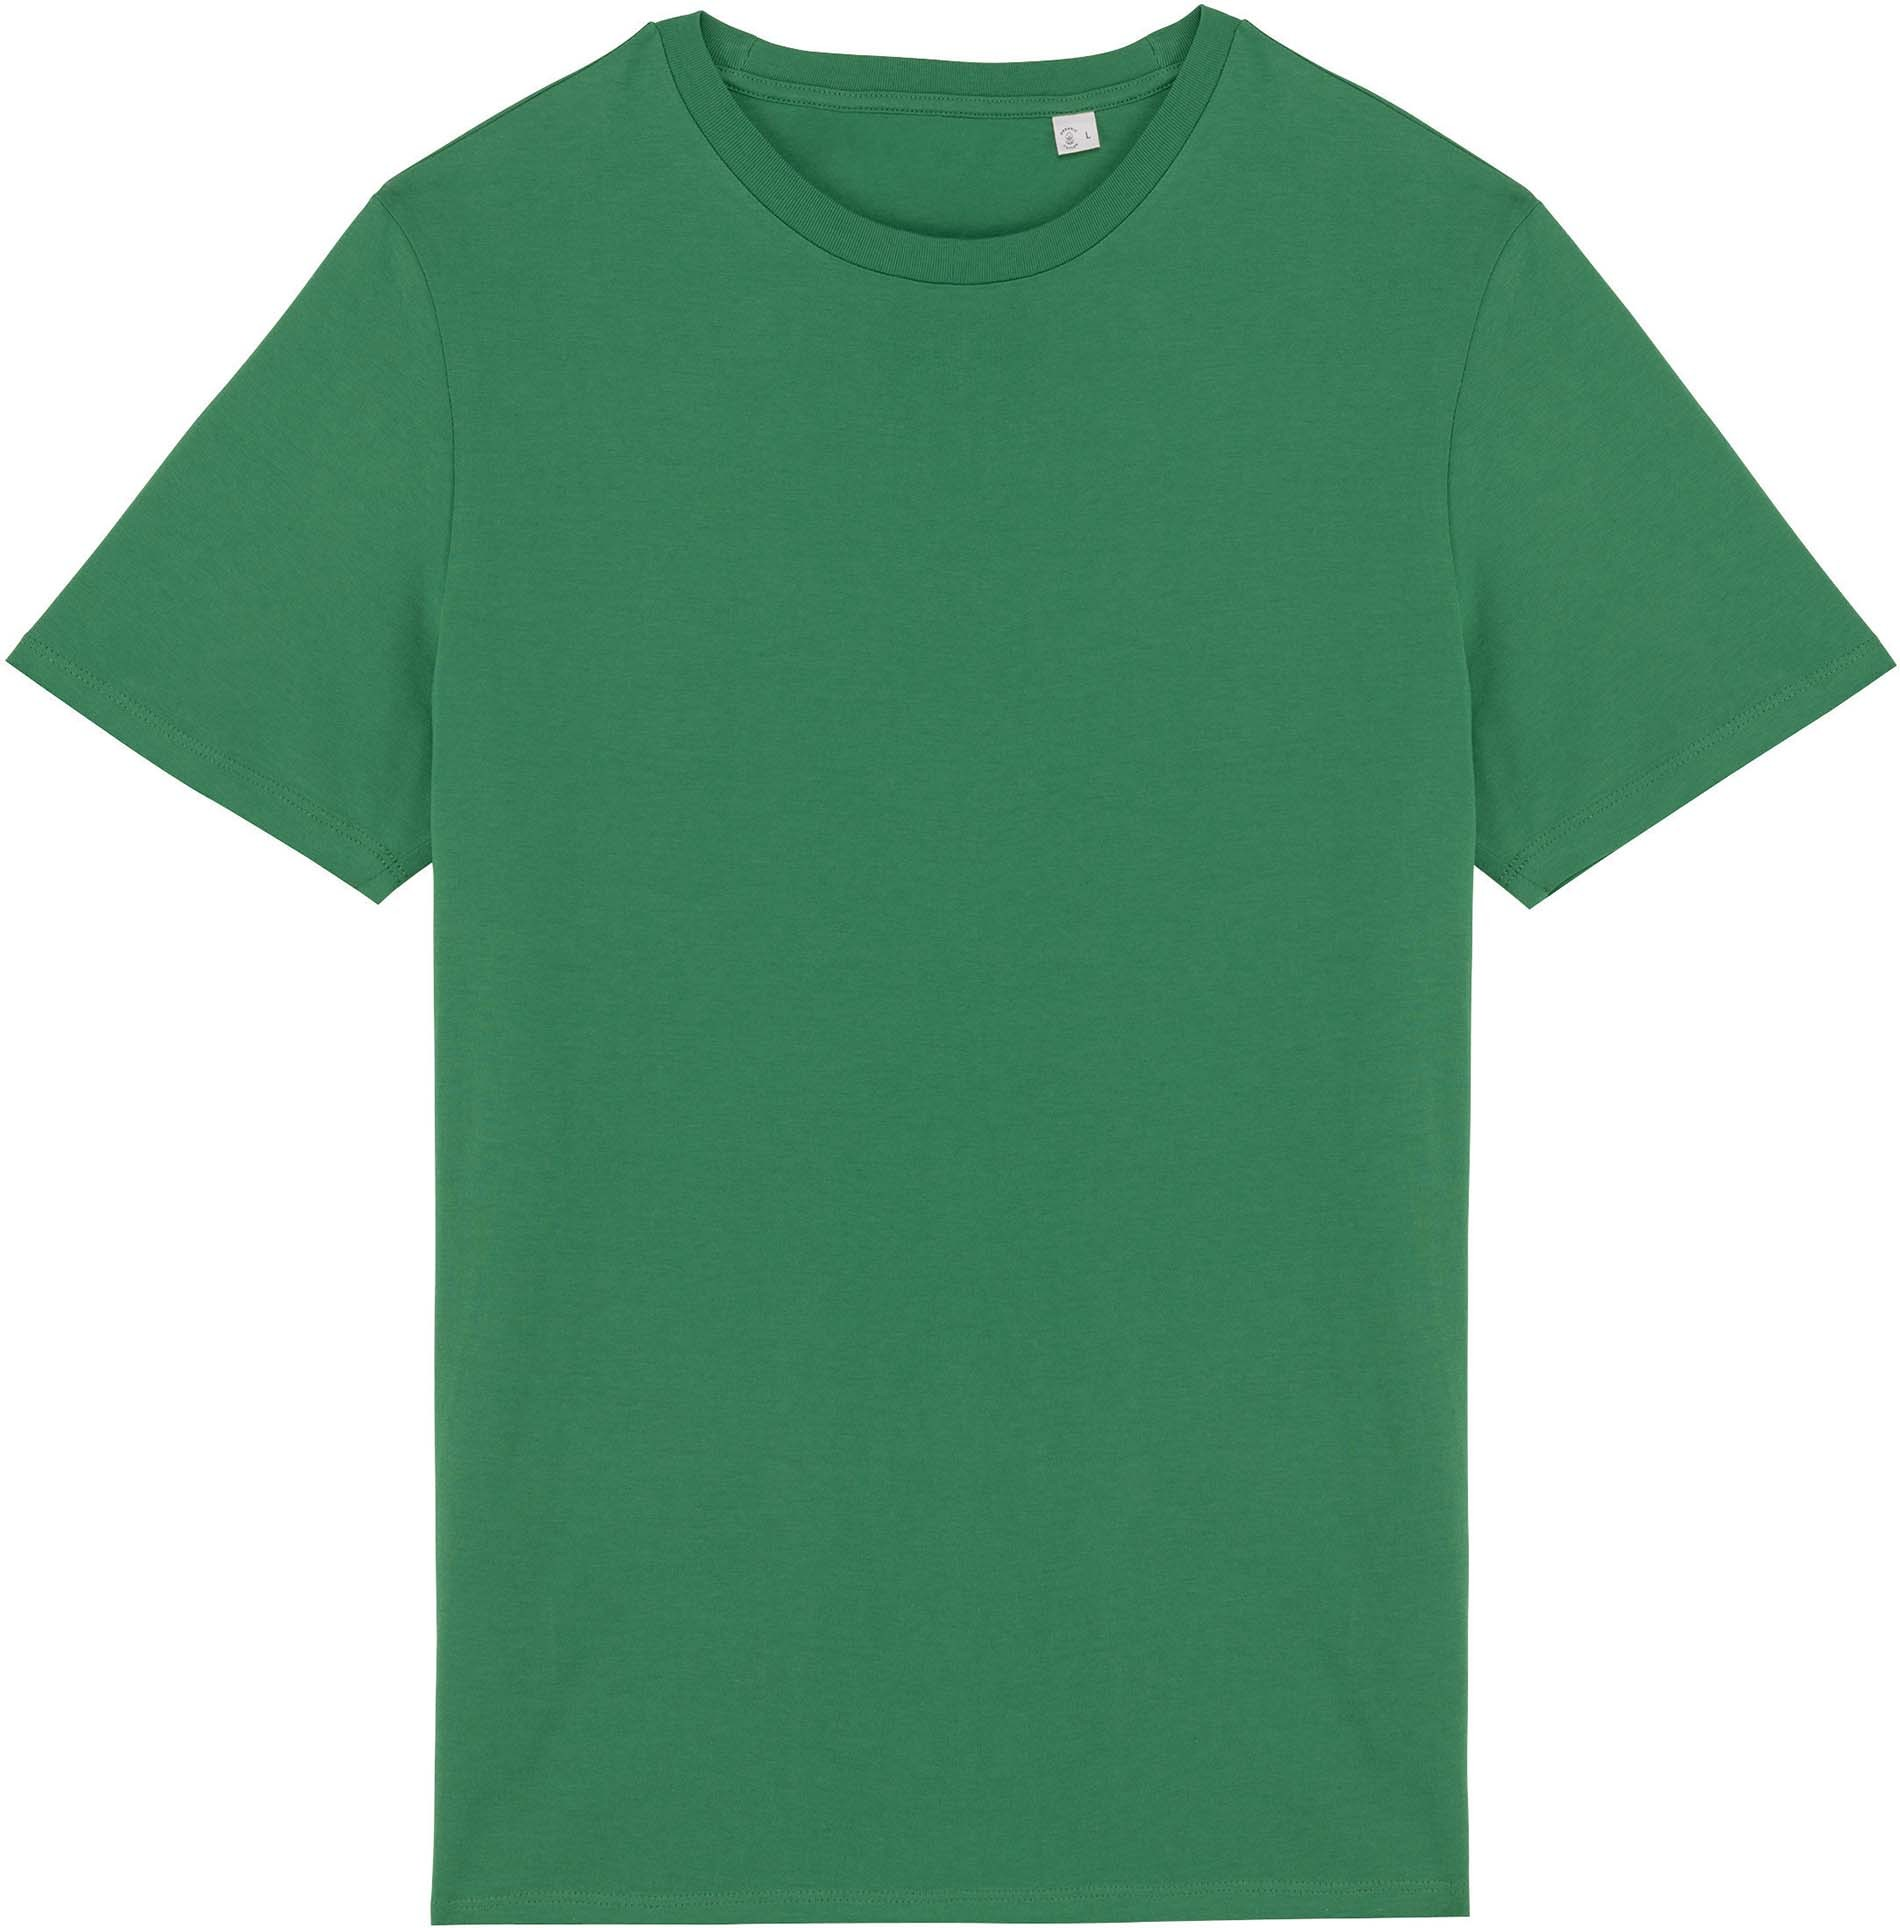 Tee-shirt manches courtes unisexe - 2-1843-27